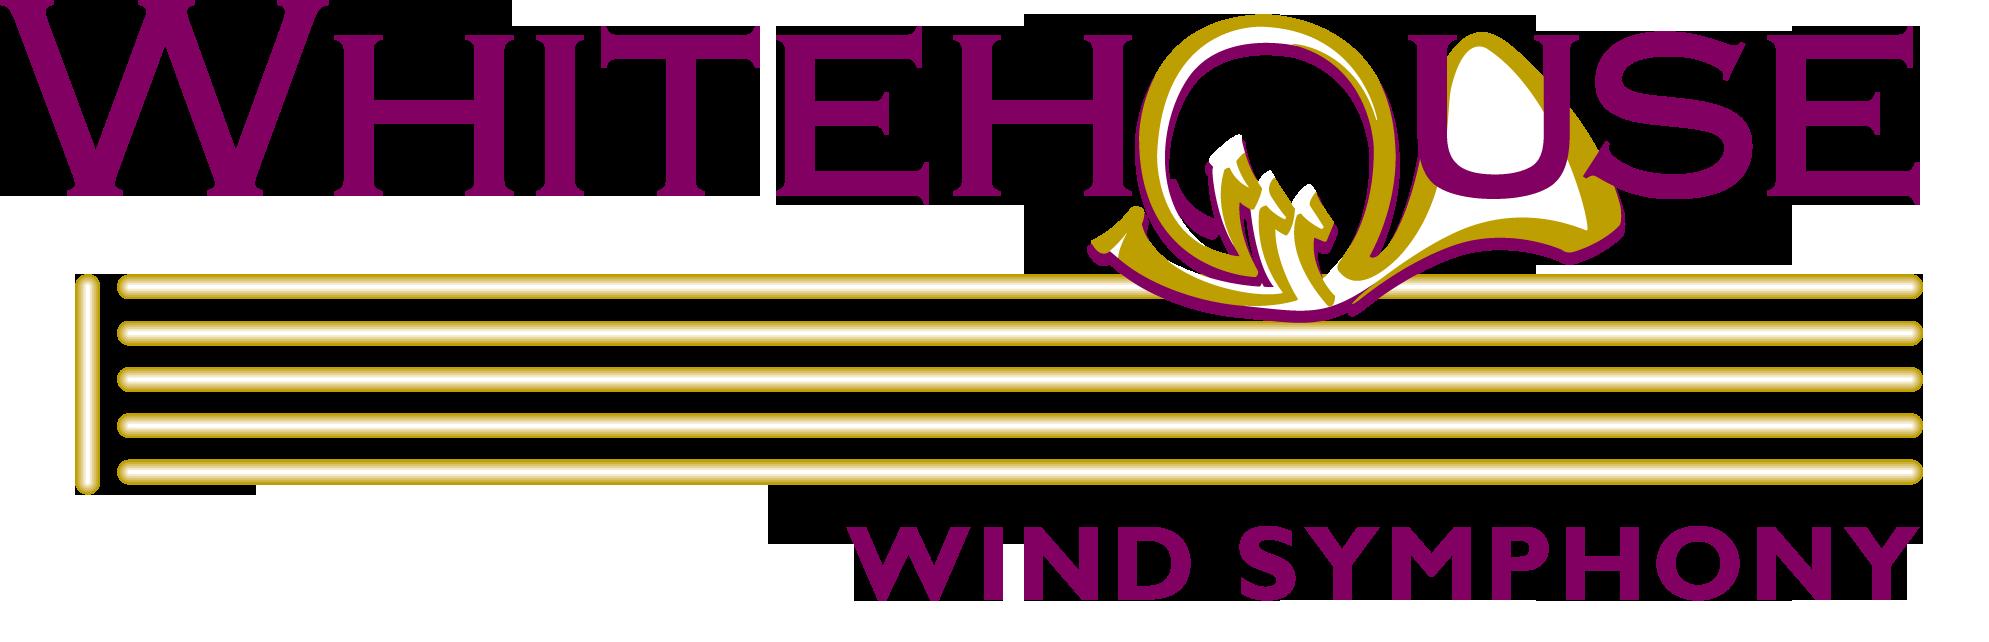 Whitehouse Wind Symphony Logo